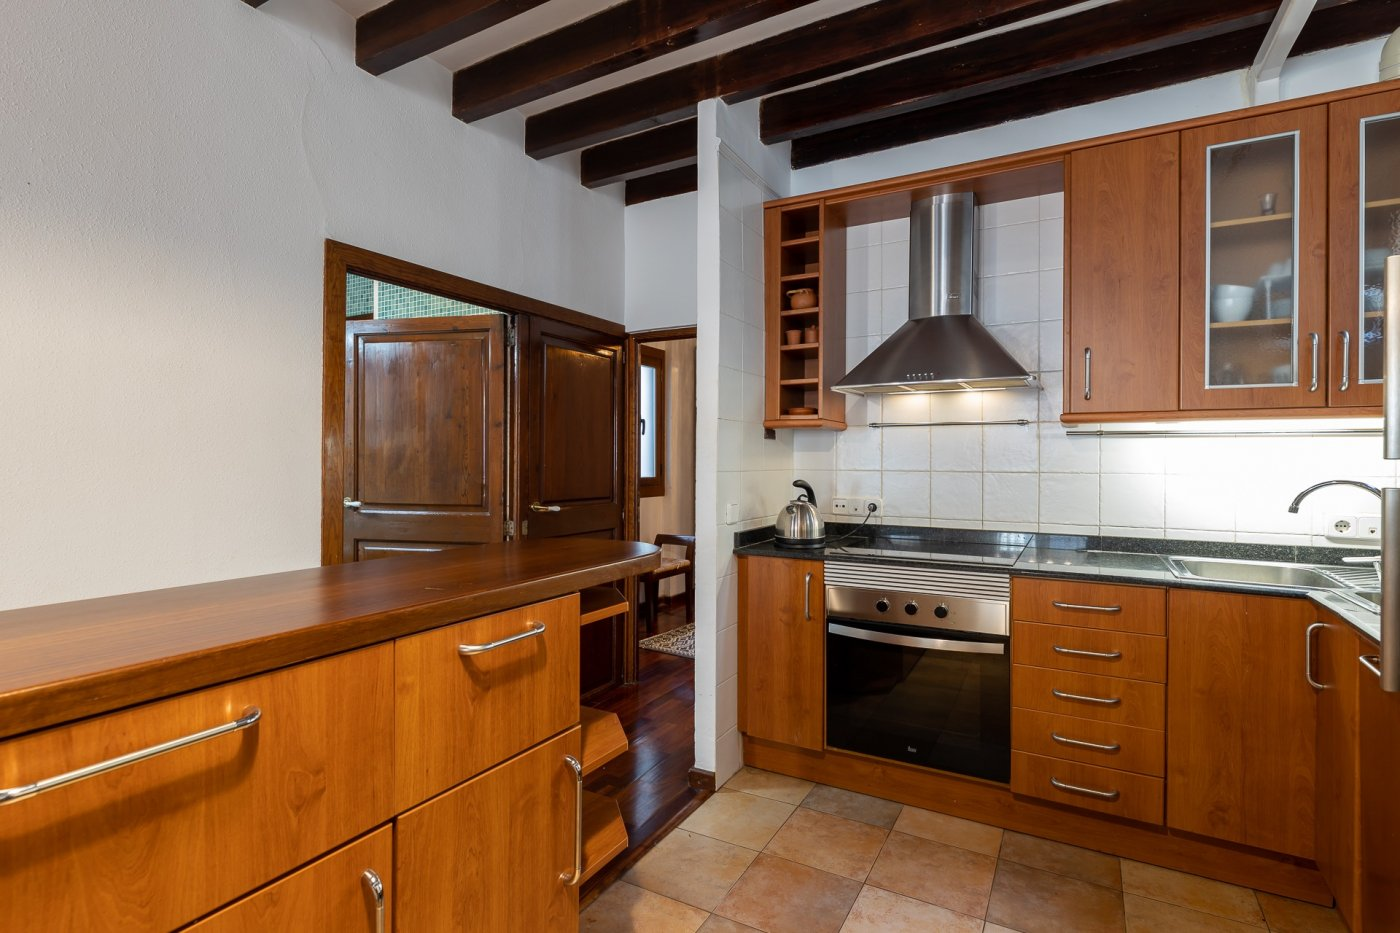 Espectacular apartamento en centro de palma - imagenInmueble3